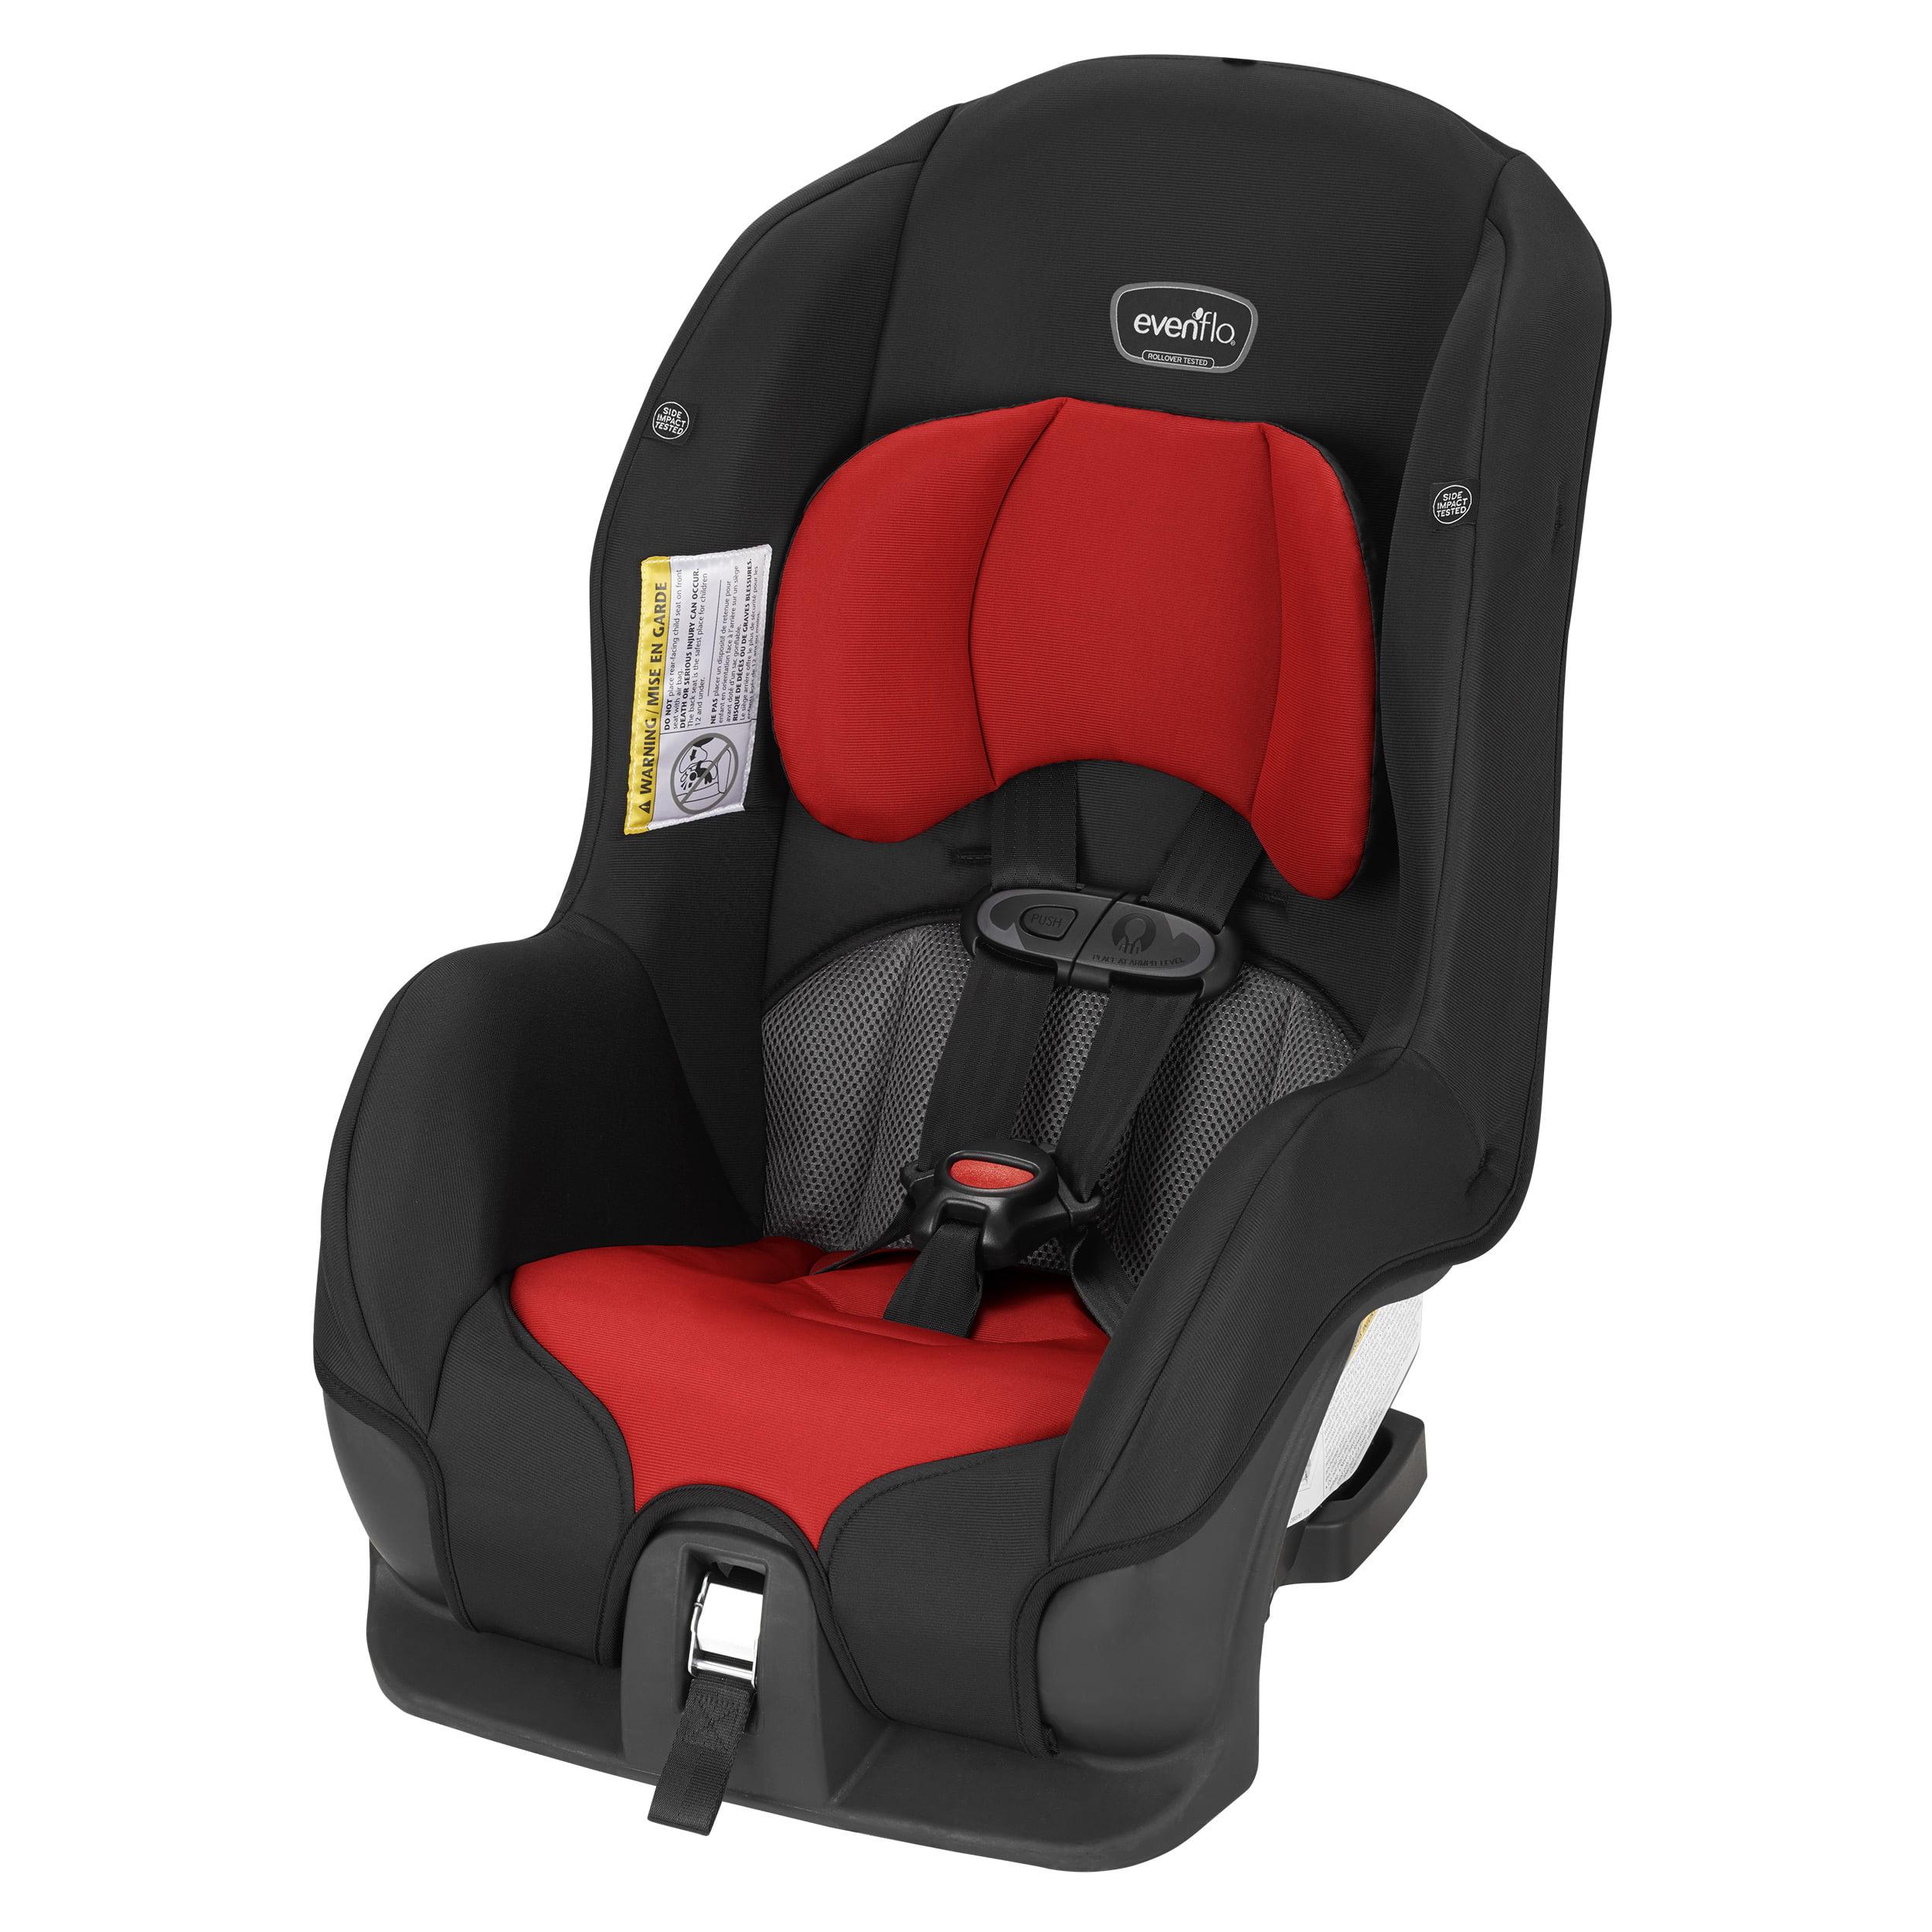 Evenflo Tribute LX Convertible Car Seat